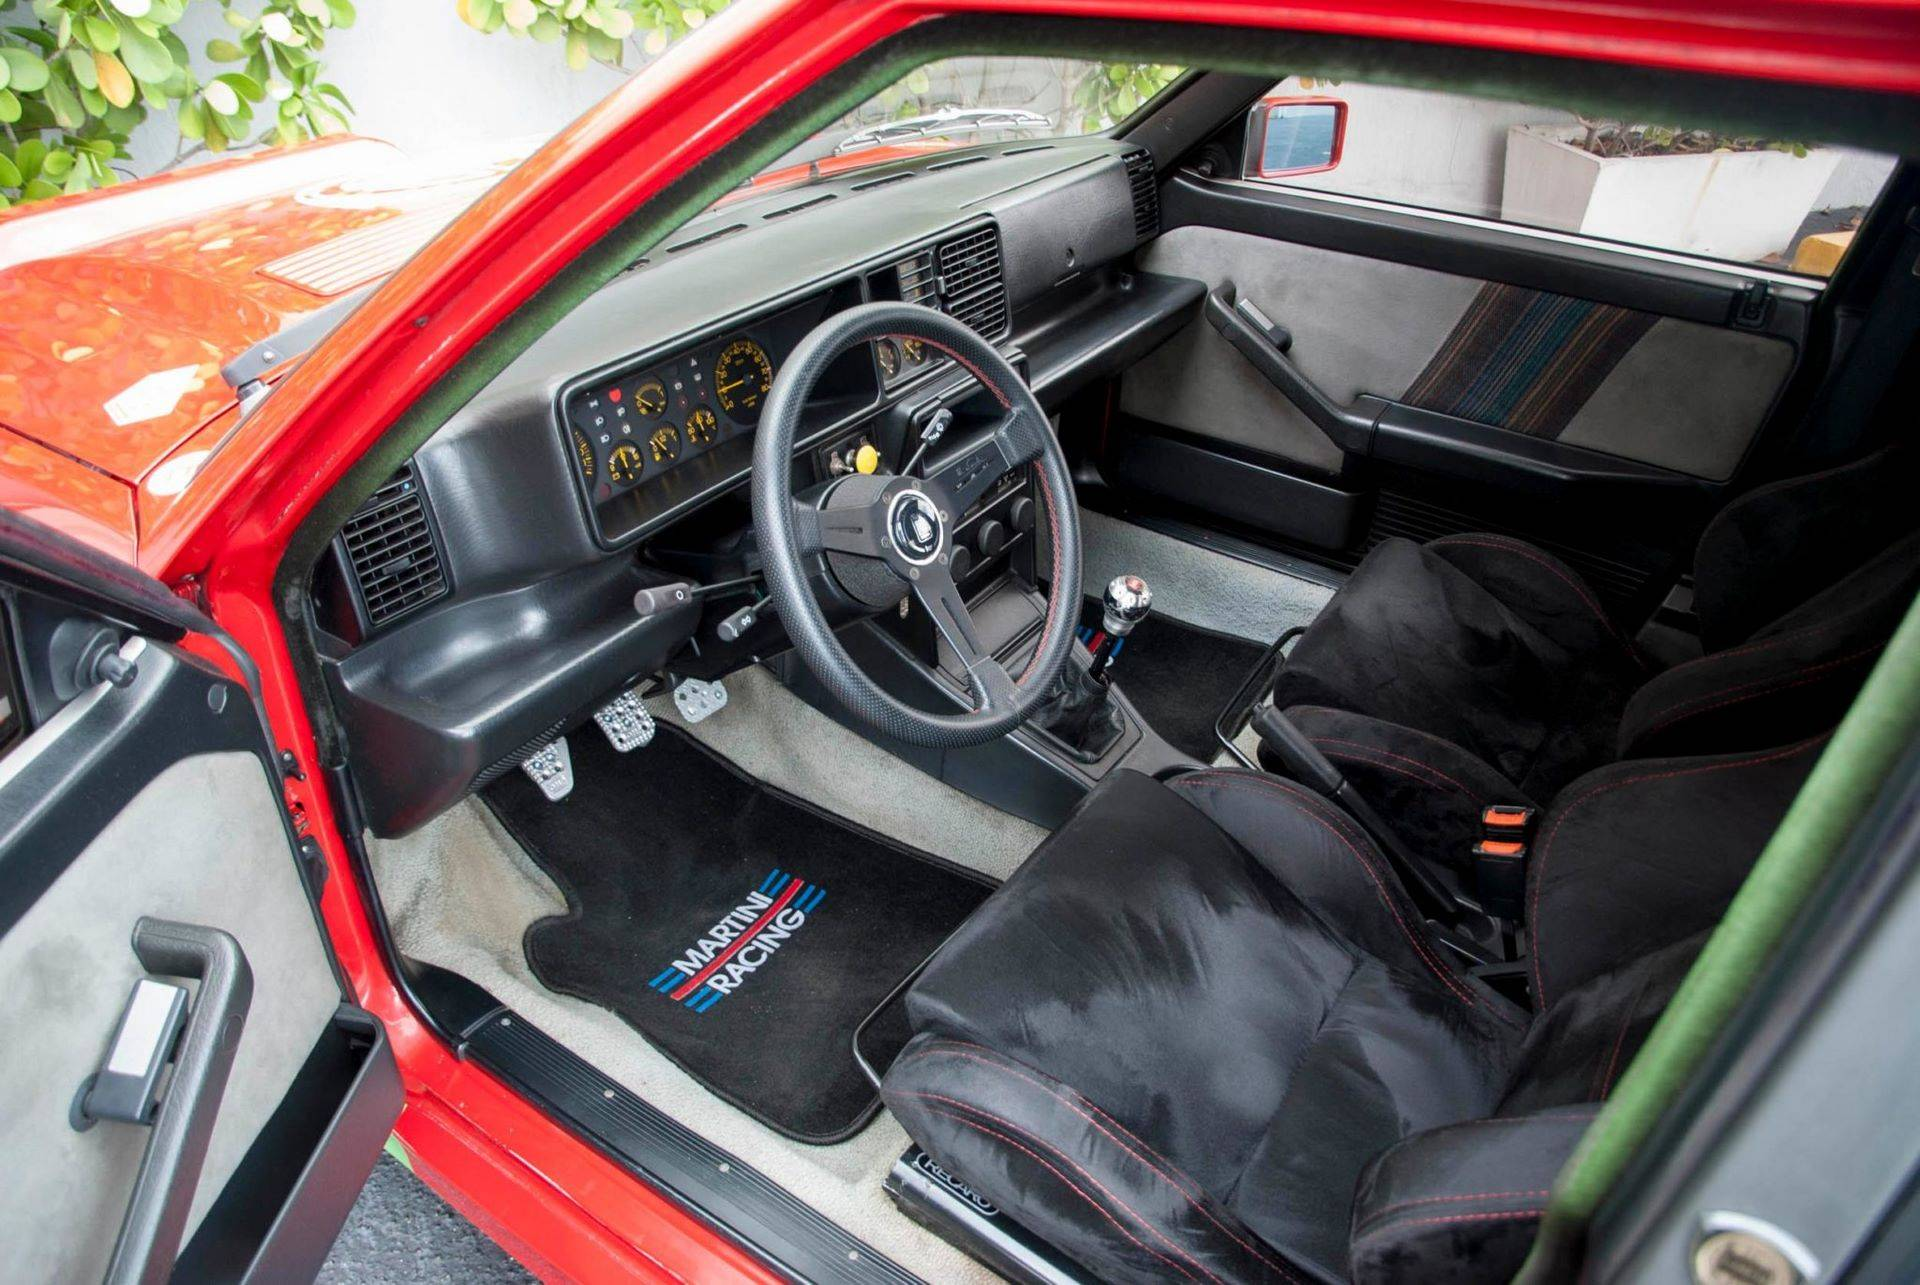 Lancia-Delta-Integrale-8V-1989-84